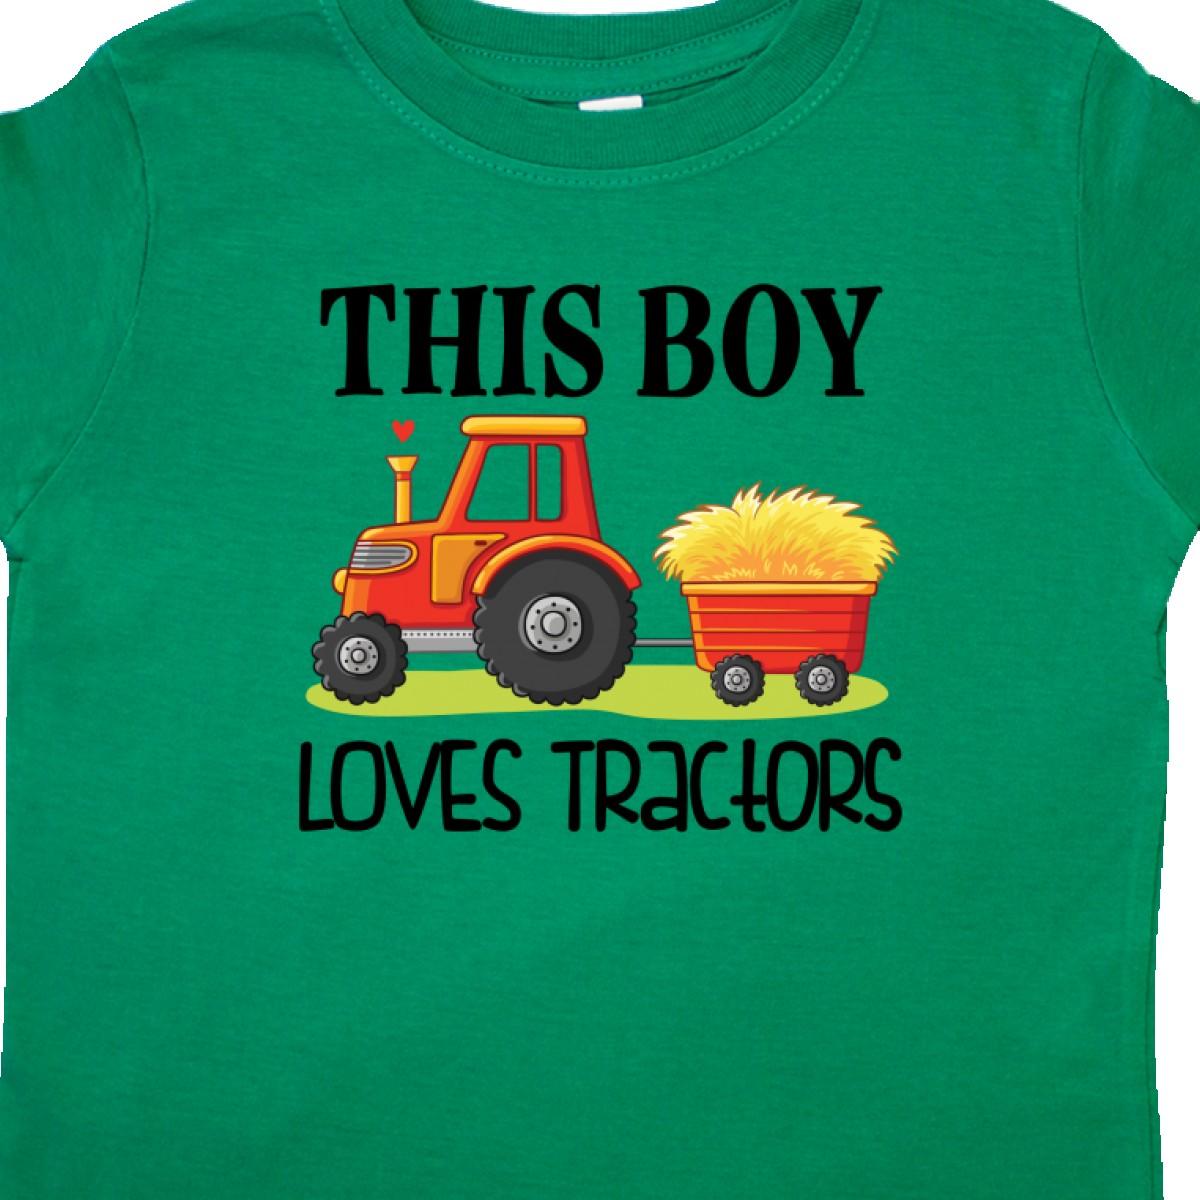 Inktastic-Farming-Cute-Boy-Loves-Tractors-Toddler-T-Shirt-Farm-Childs-Toys-Kids thumbnail 10